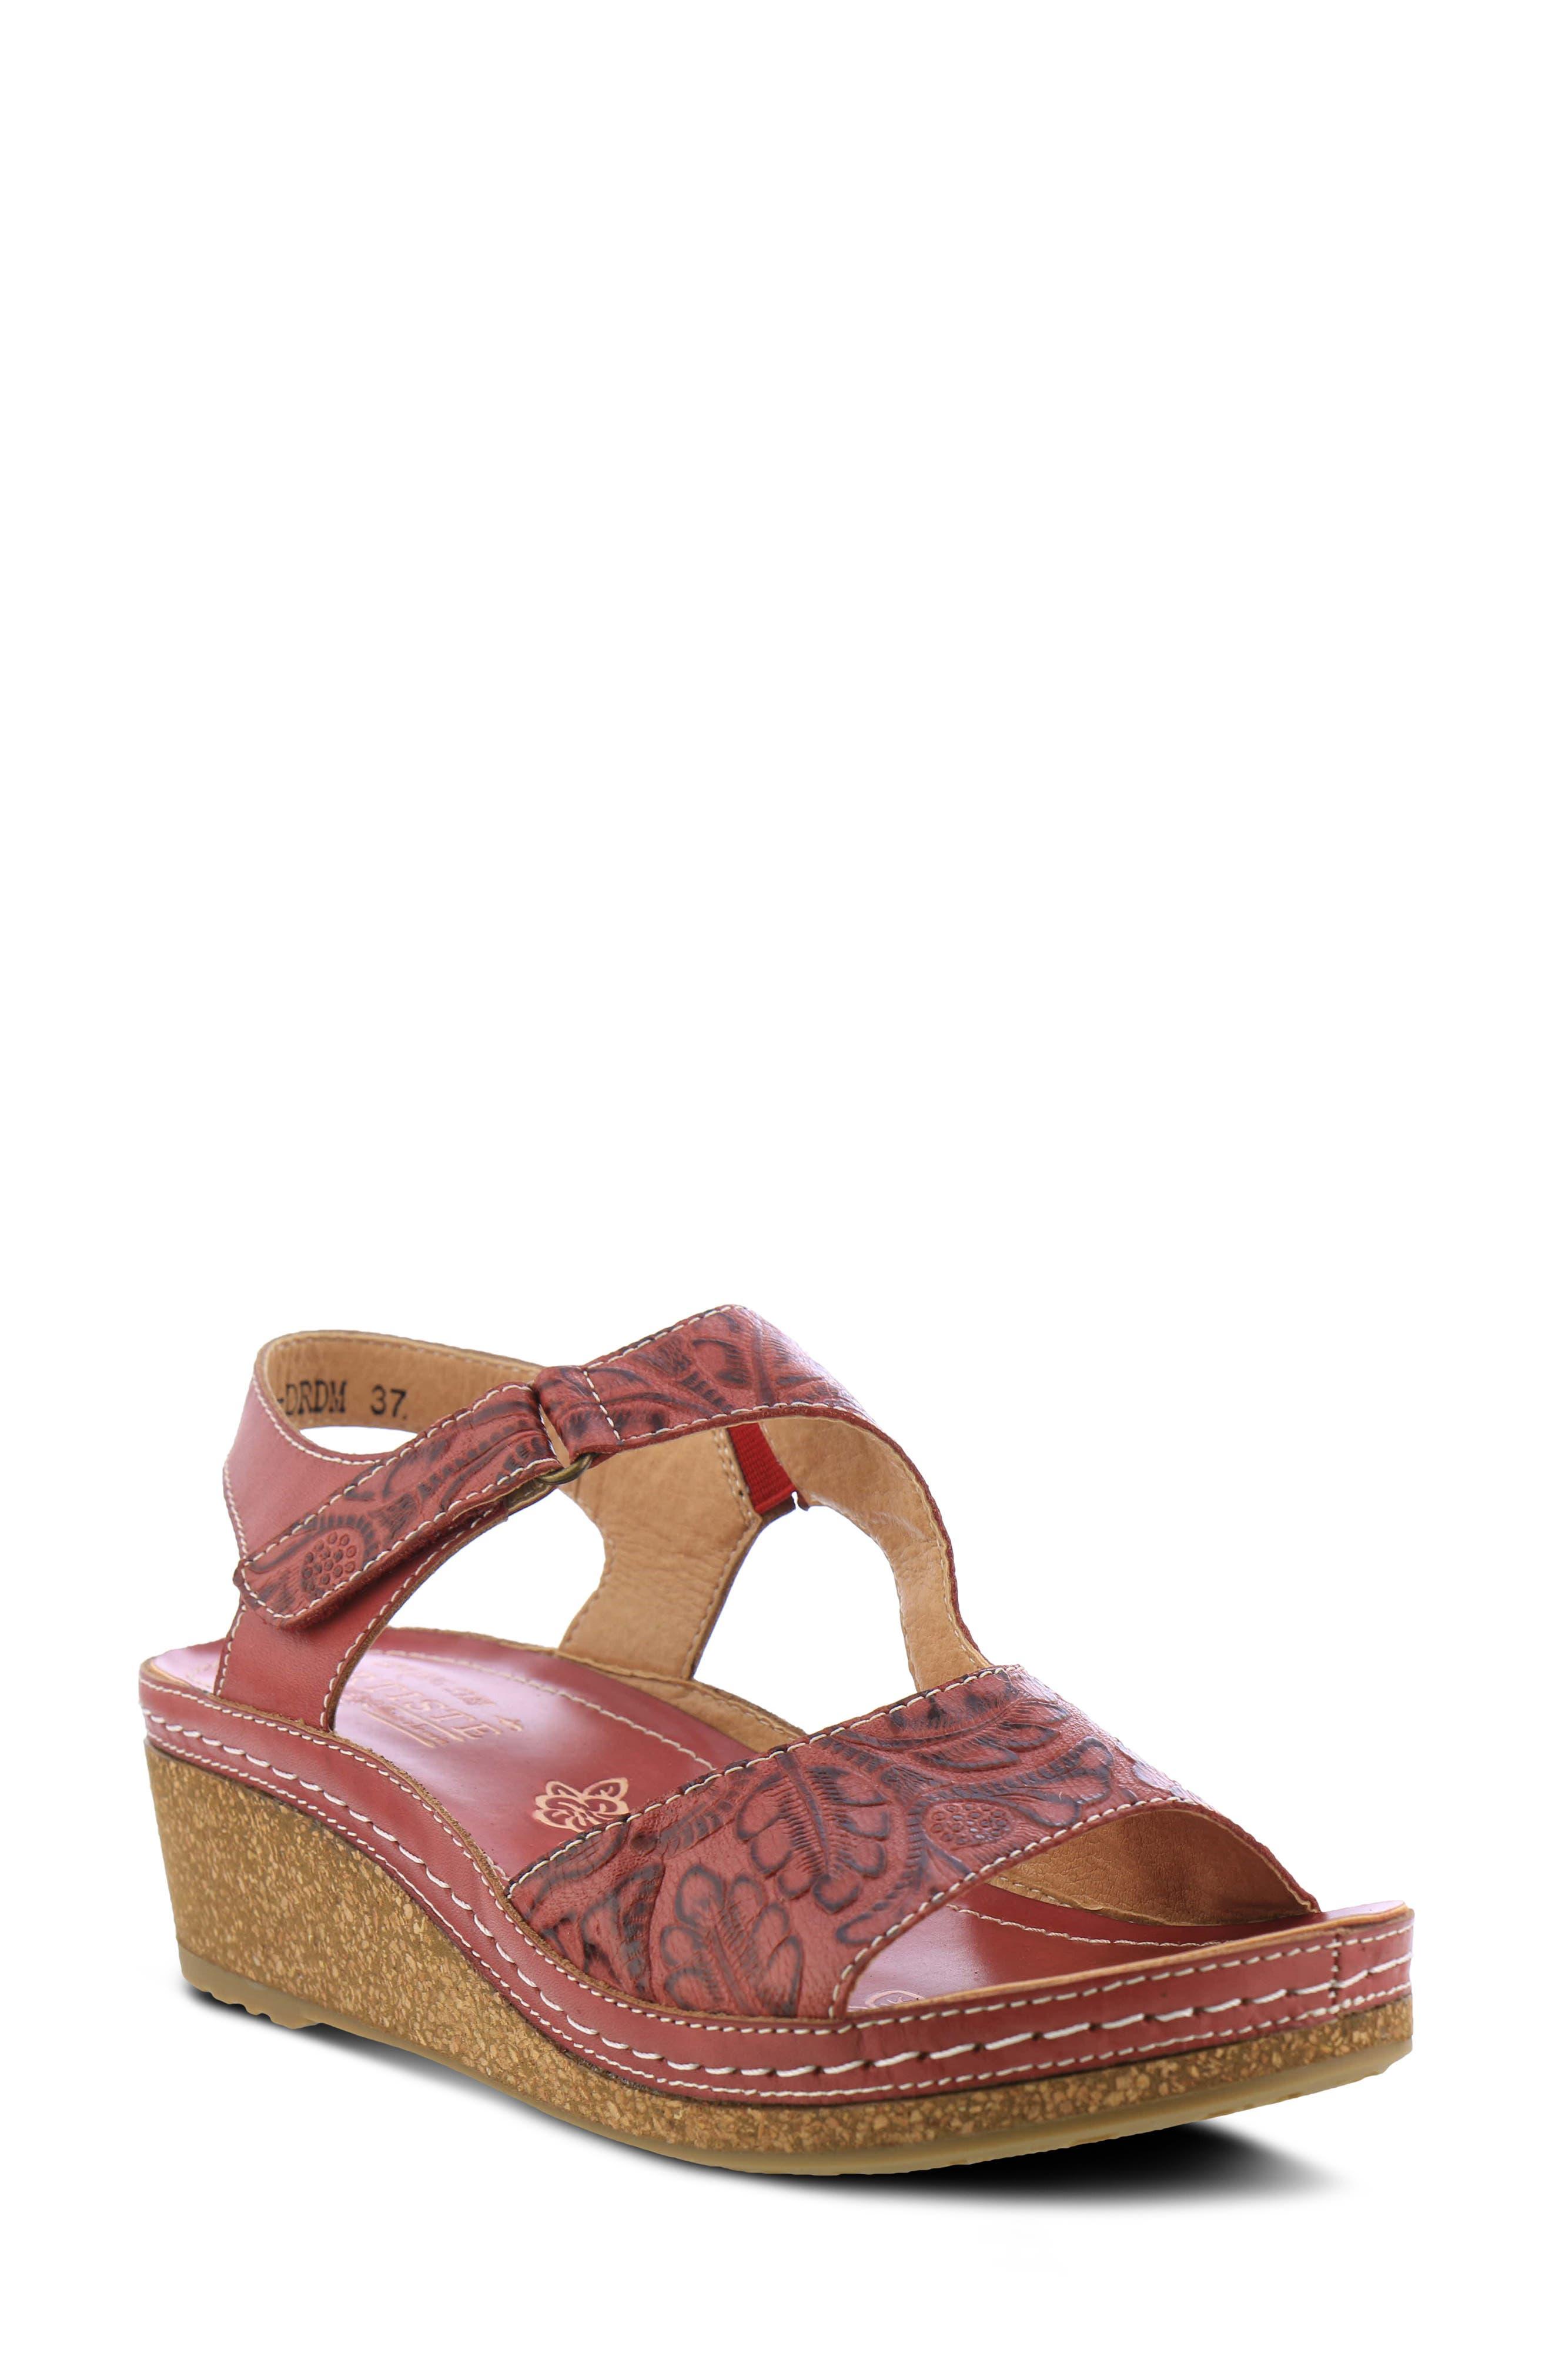 Zeta Wedge Sandal